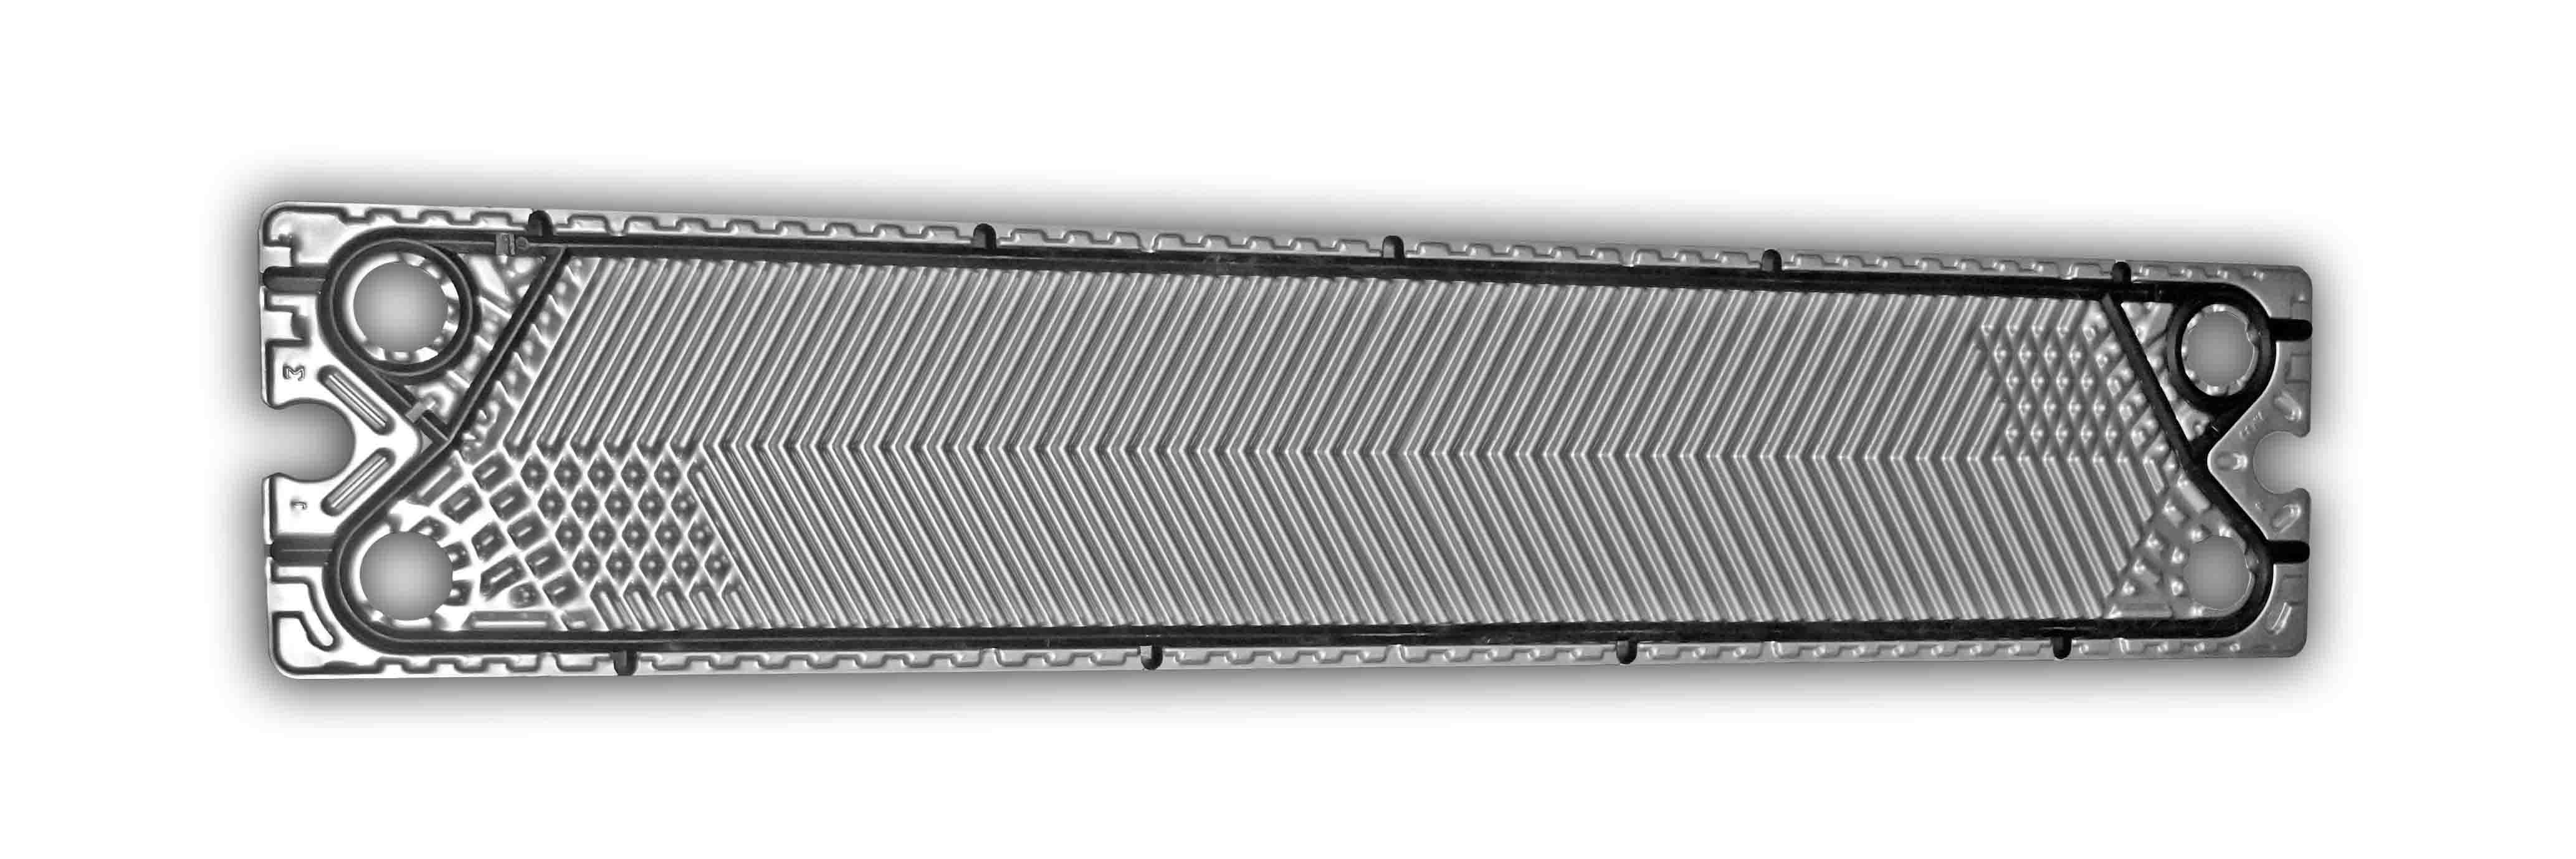 Пластина на пластинчатый теплообменник теплообменник тпр-1 свыше 50 пластин цена челябинск